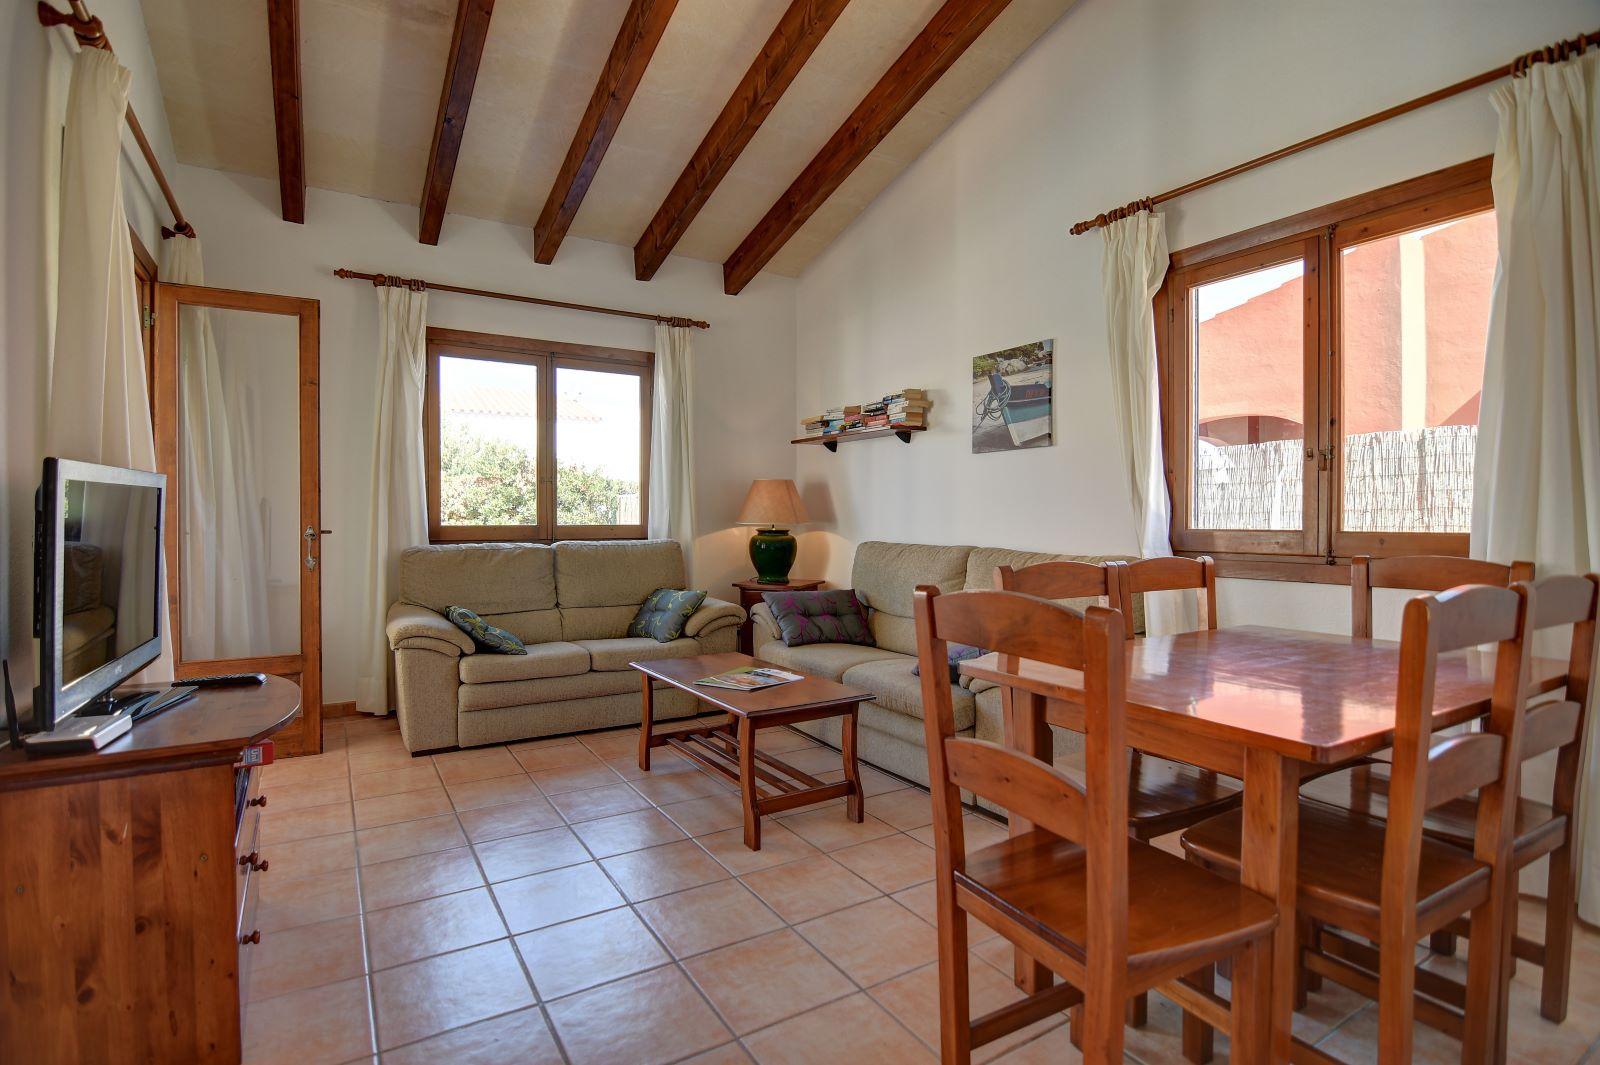 Villa in Cap D'Artruitx Ref: H2589 4